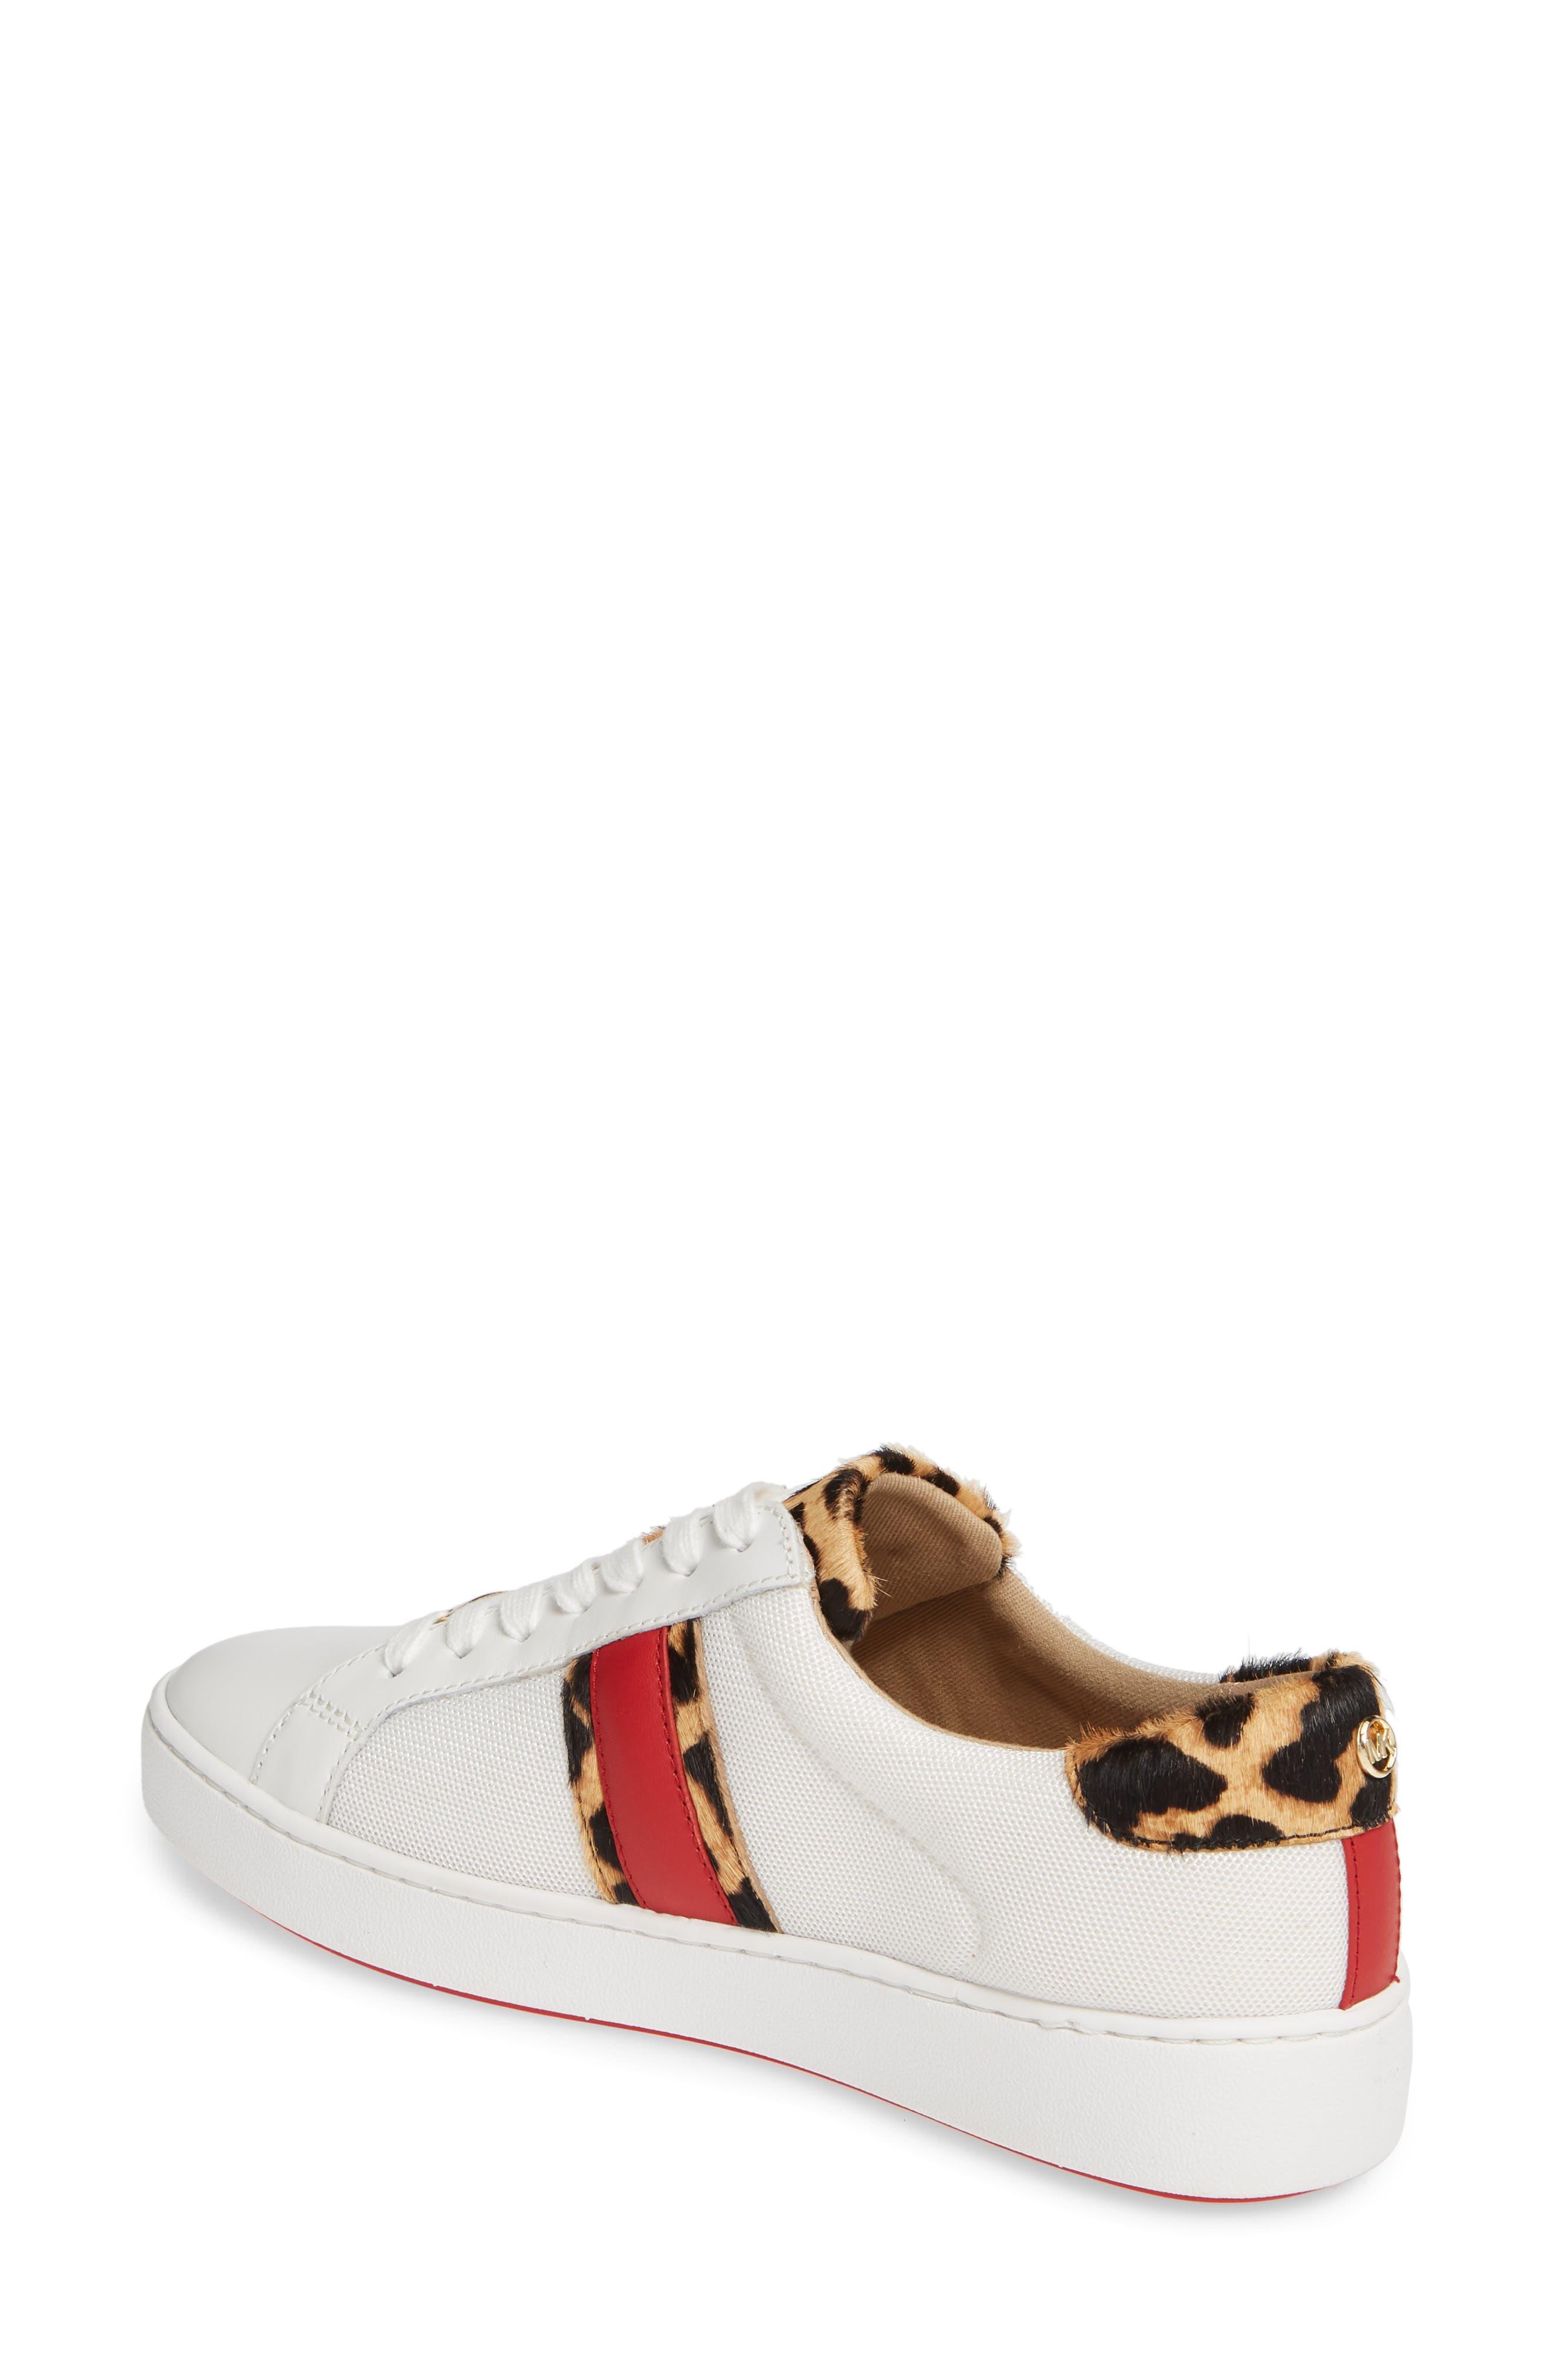 MICHAEL MICHAEL KORS, Irving Stripe Sneaker, Alternate thumbnail 2, color, OPTIC WHITE/ NATURAL